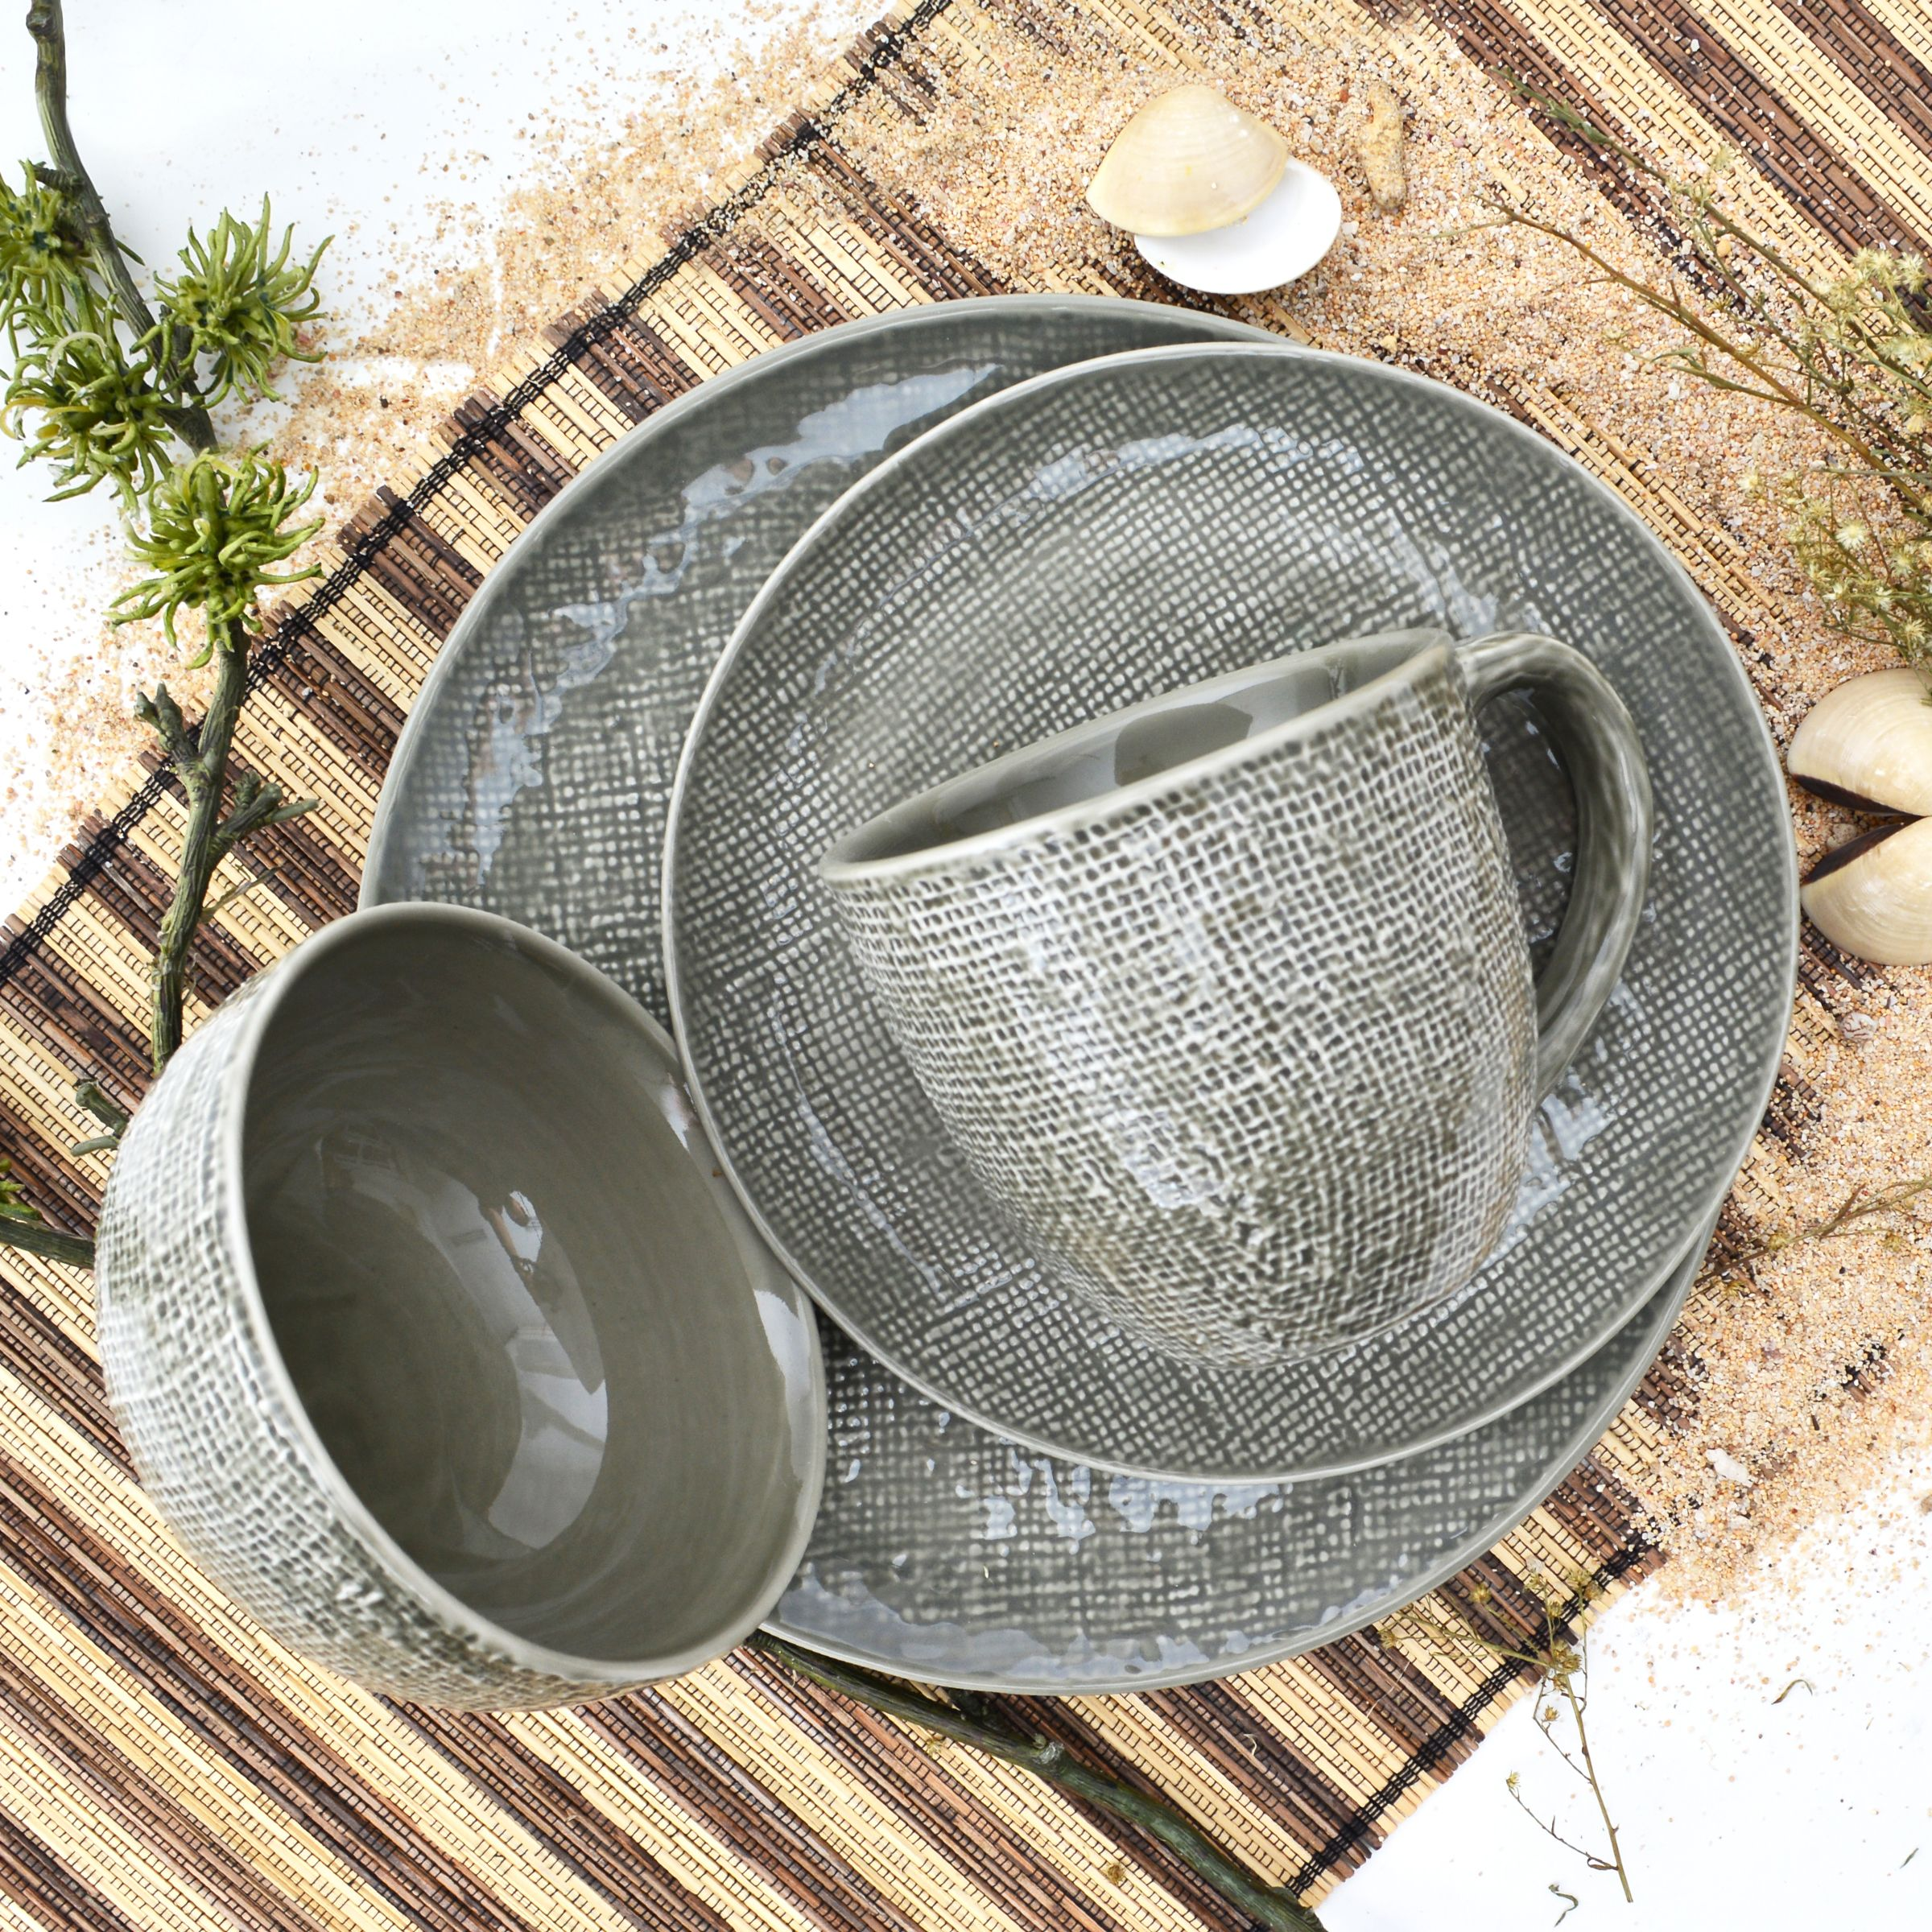 sango kain taupe 16 piece dinnerware set service for 4